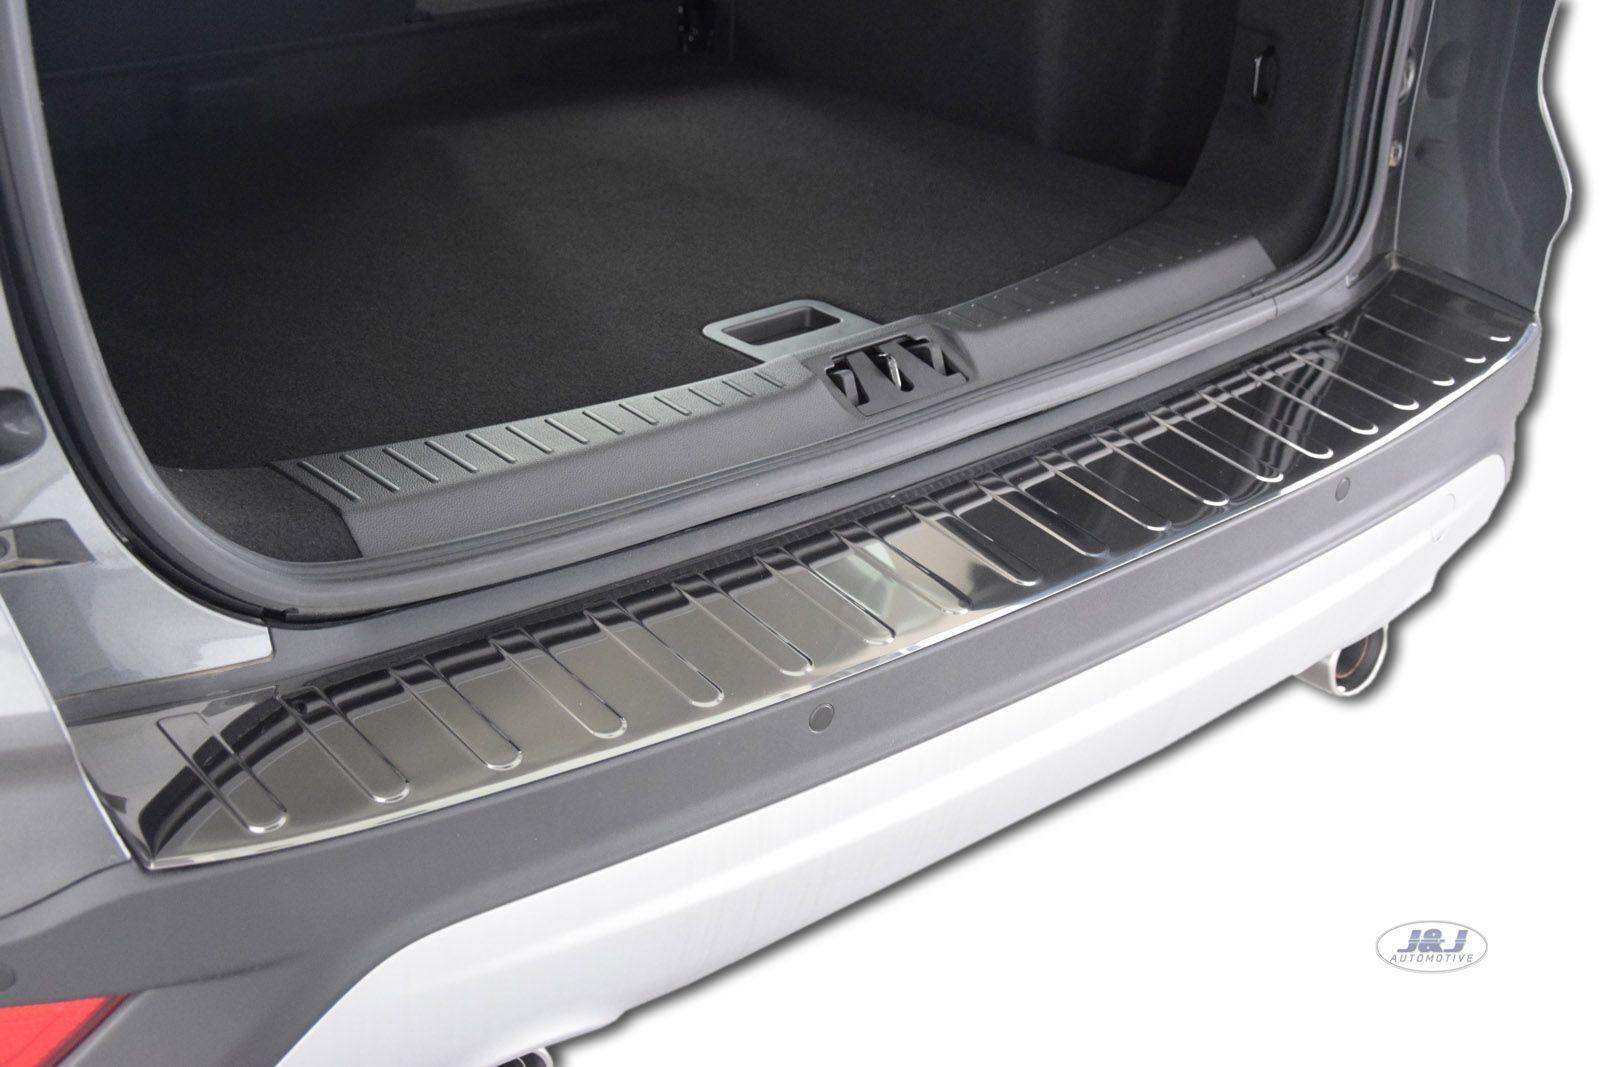 Bumper Scratch Guard Protector fits for Ford Kuga I SUV 5-door 2008-2012